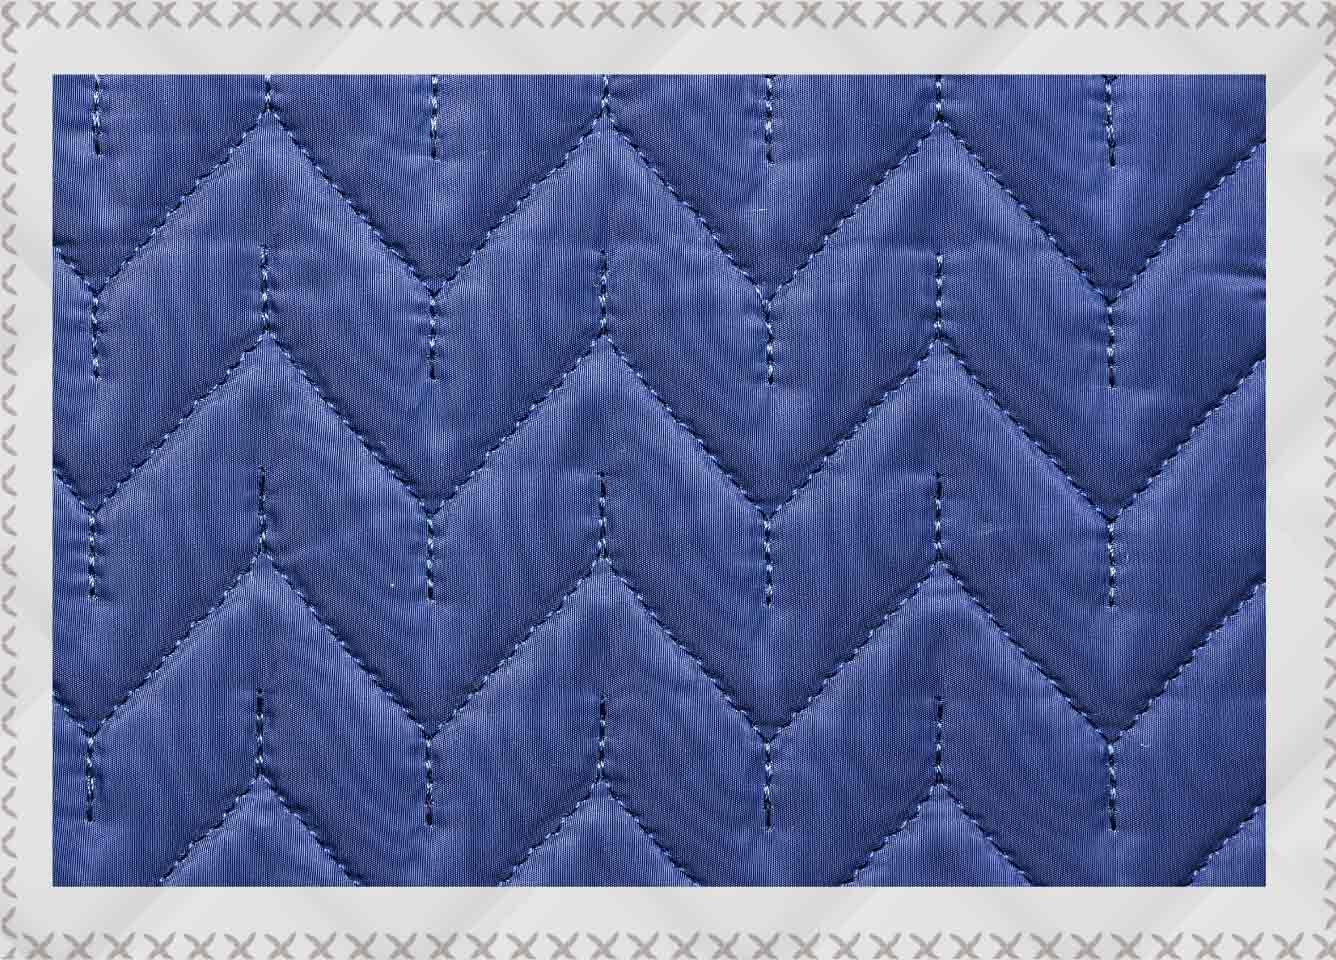 elka-kapitone-giyim-tekstil-sektoru-as0019